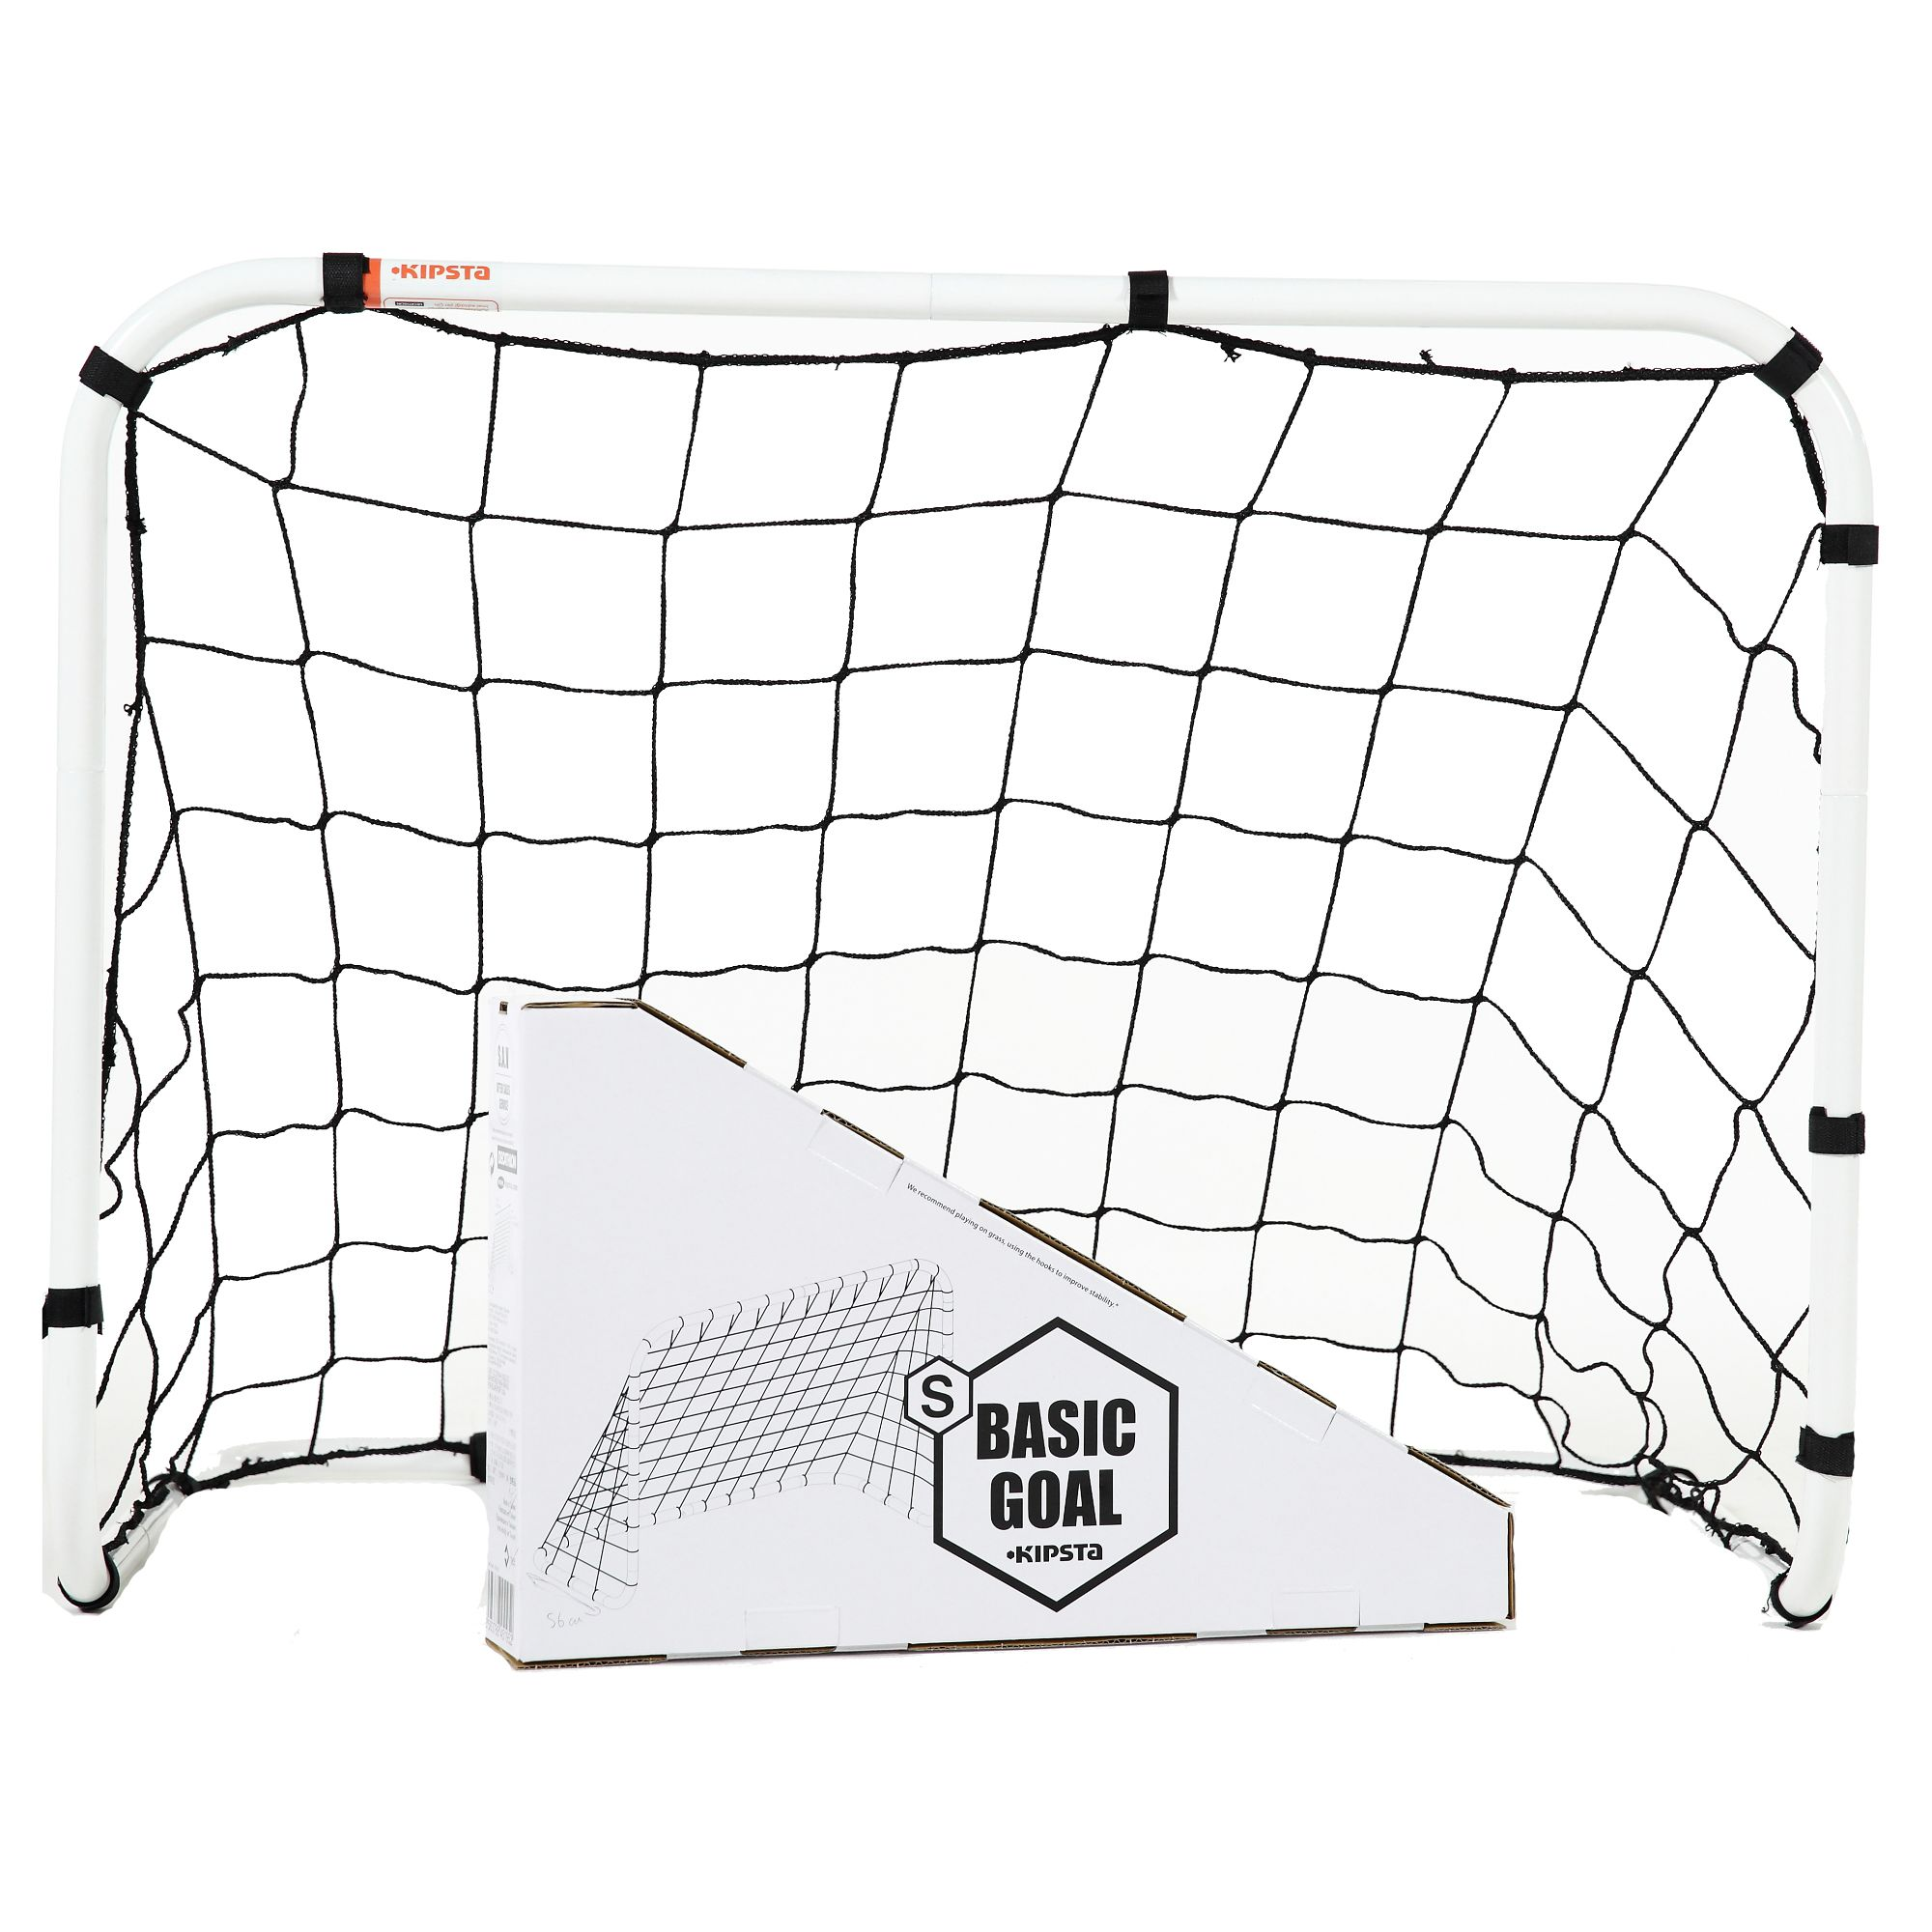 Mini But De Football Basic Goal Taille S Blanc Clubs  # Recherche Vestiaire A Transforme En Rack Sono